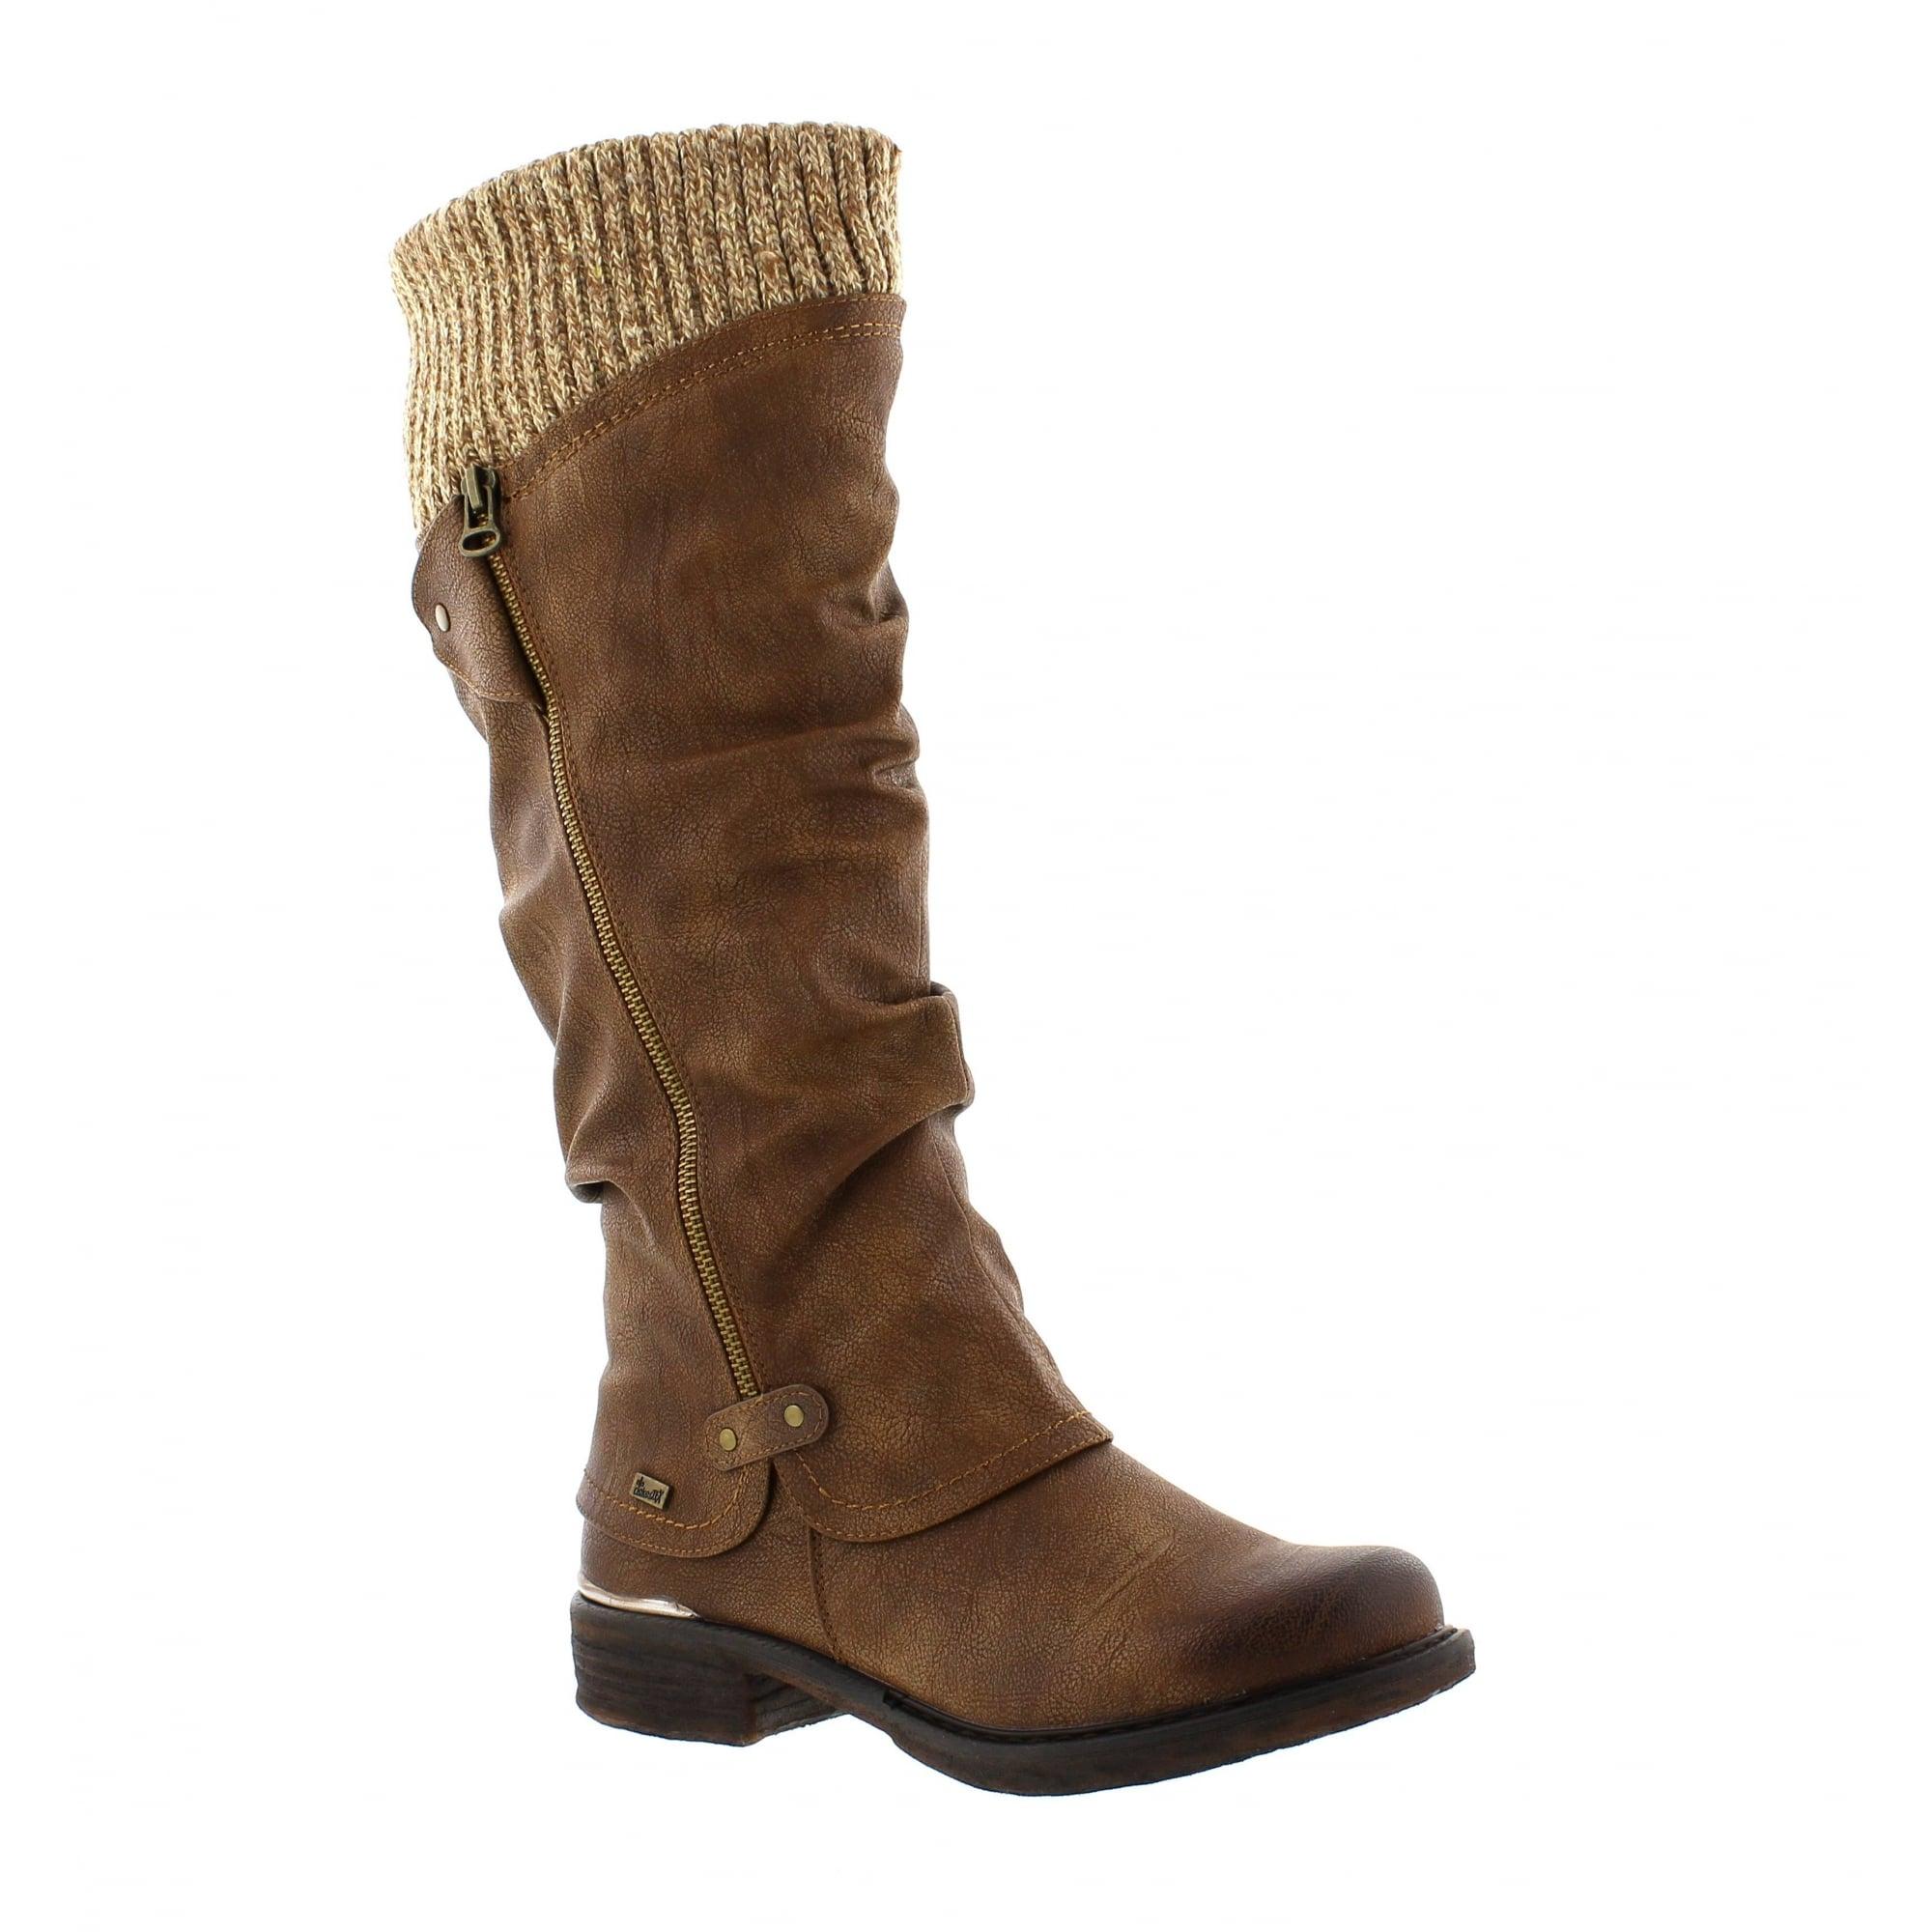 06aa968f83f7cd Rieker 98956-25 Brown Womens Knee High Boots